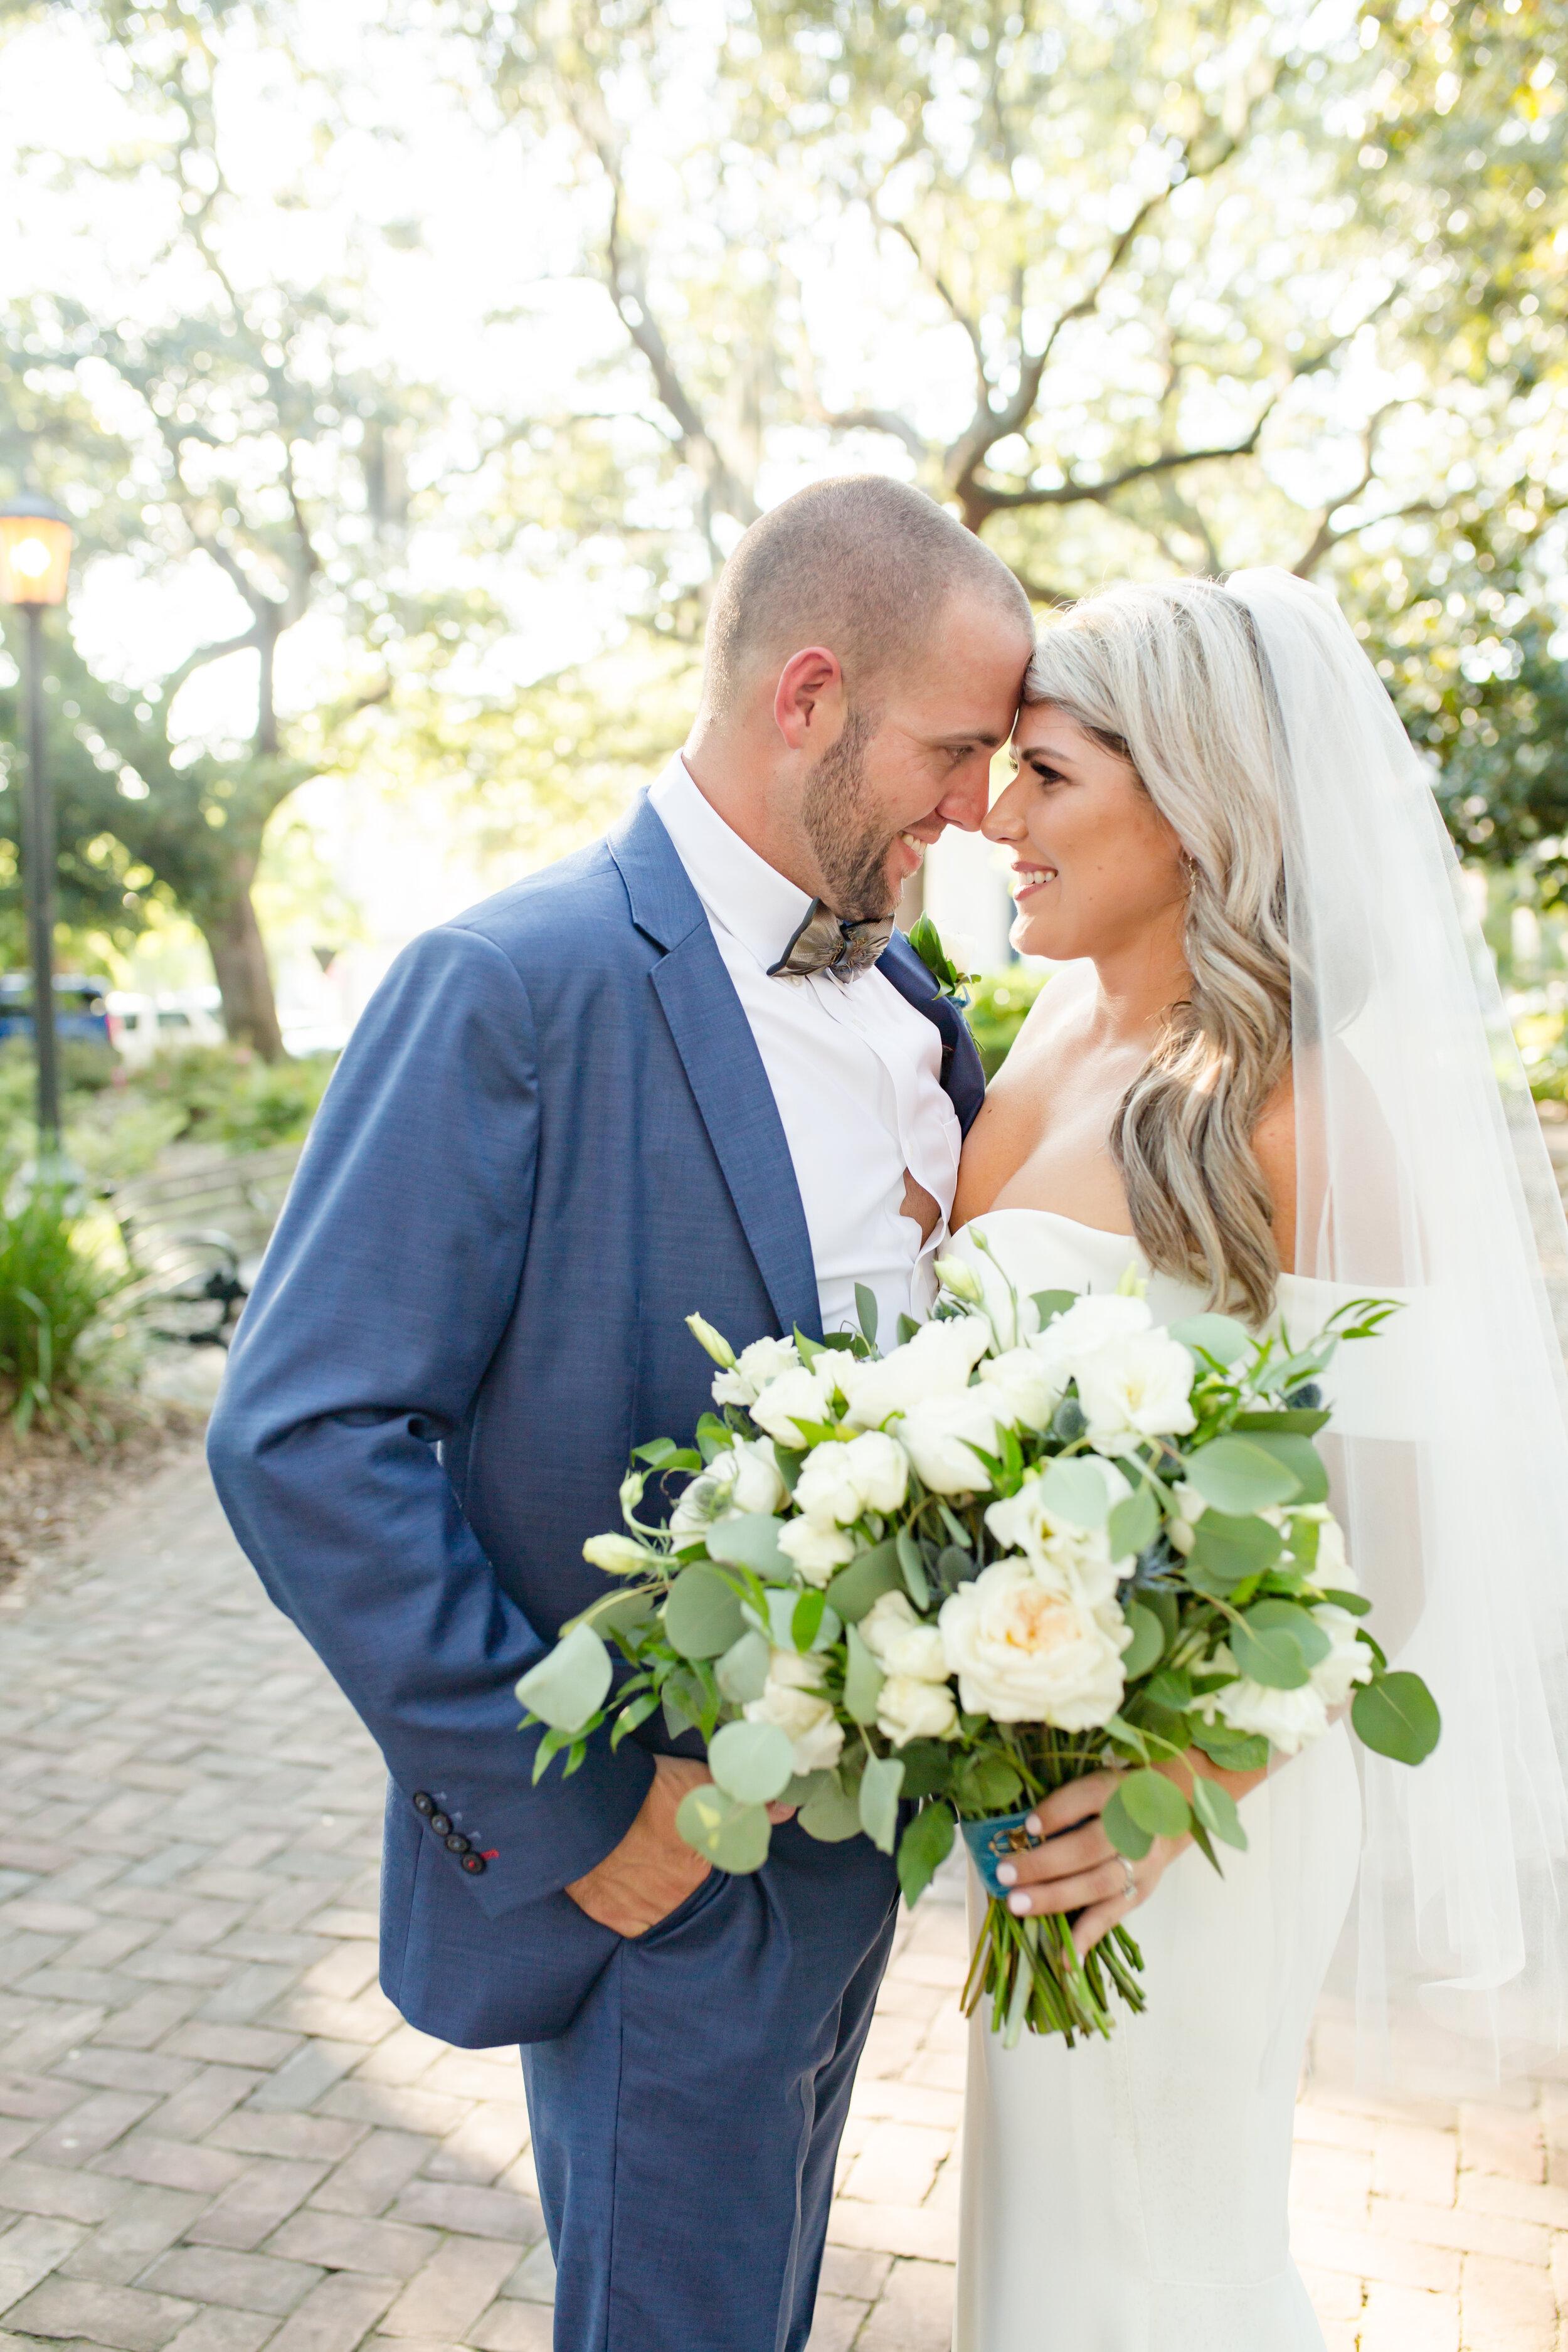 ivory-and-beau-bride-wedding-dresses-bridal-boutique-bridal-shop-savannah-wedding-shop-DGP_SohoSouthCafe_Swanagin-Mullis-465.JPG